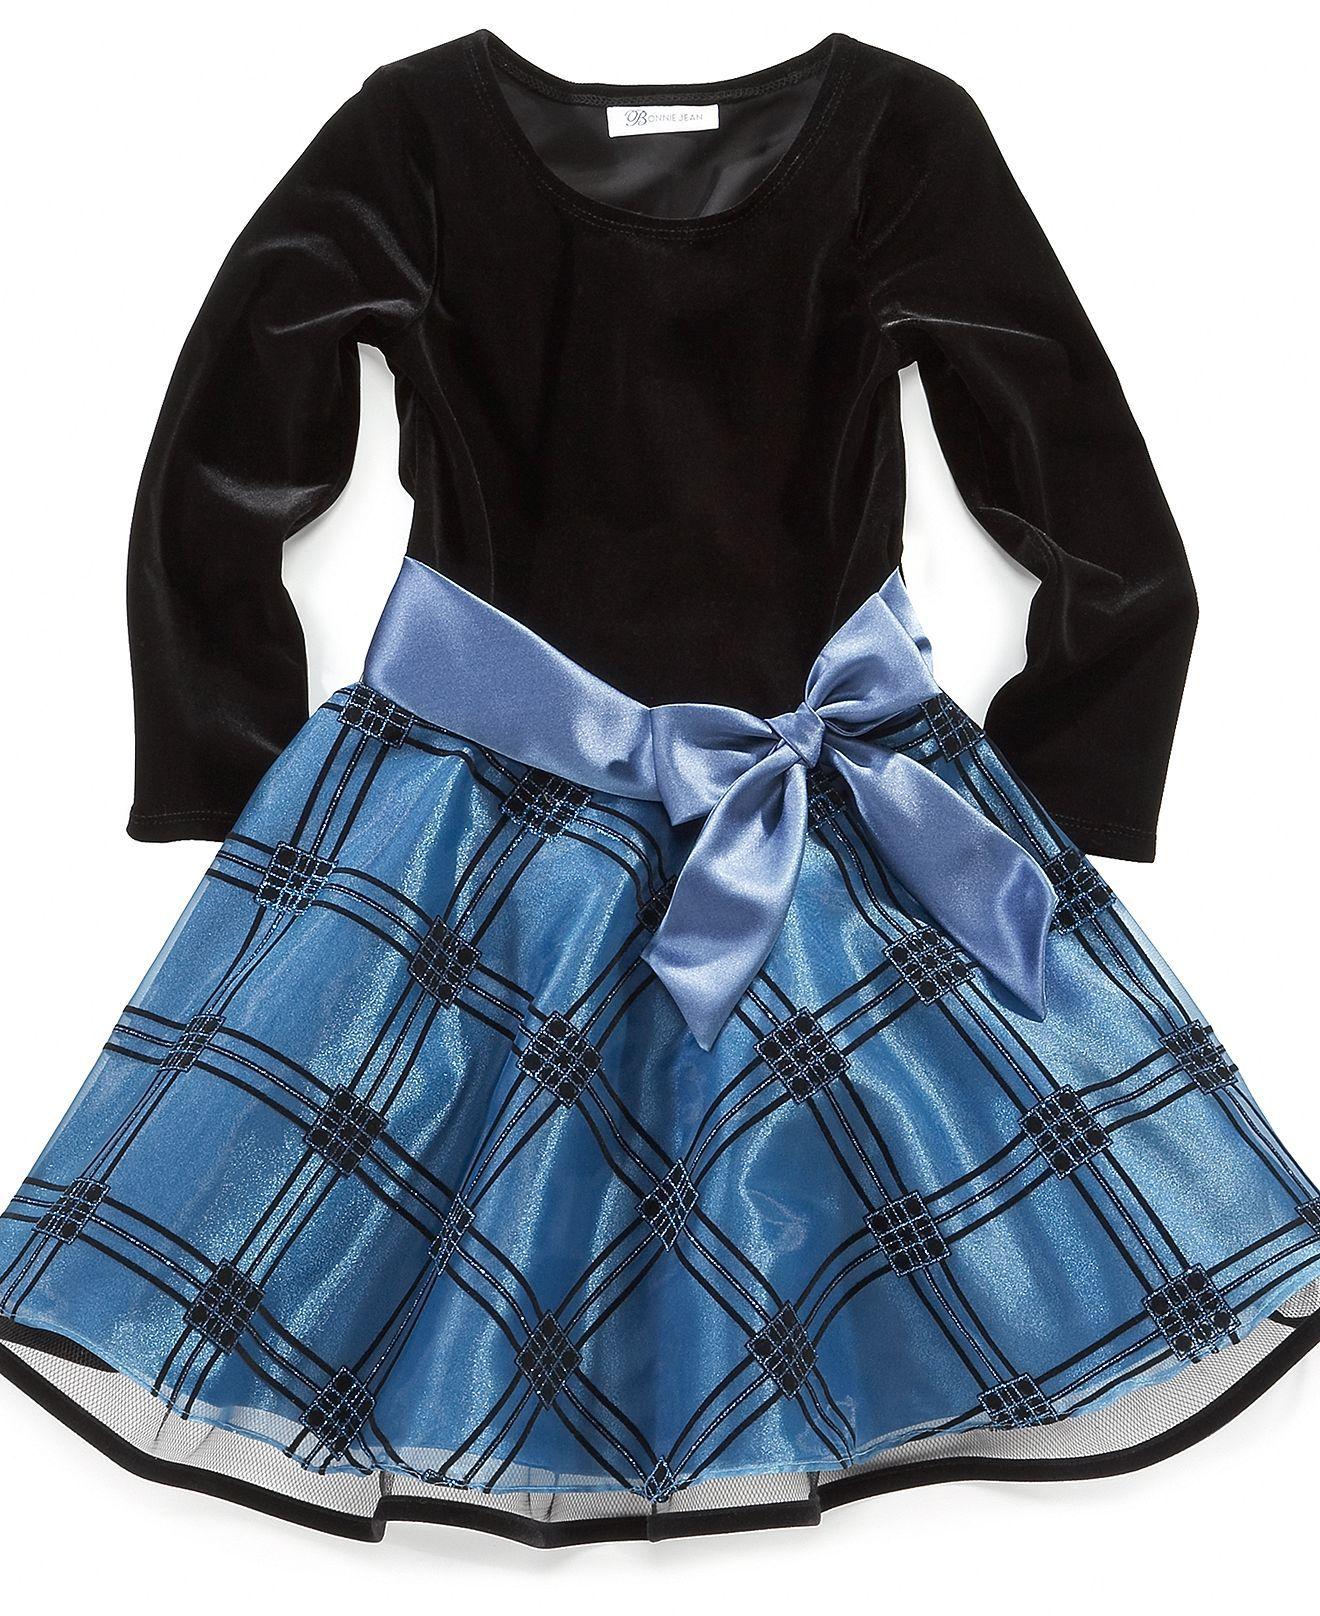 macys infant christmas dresses